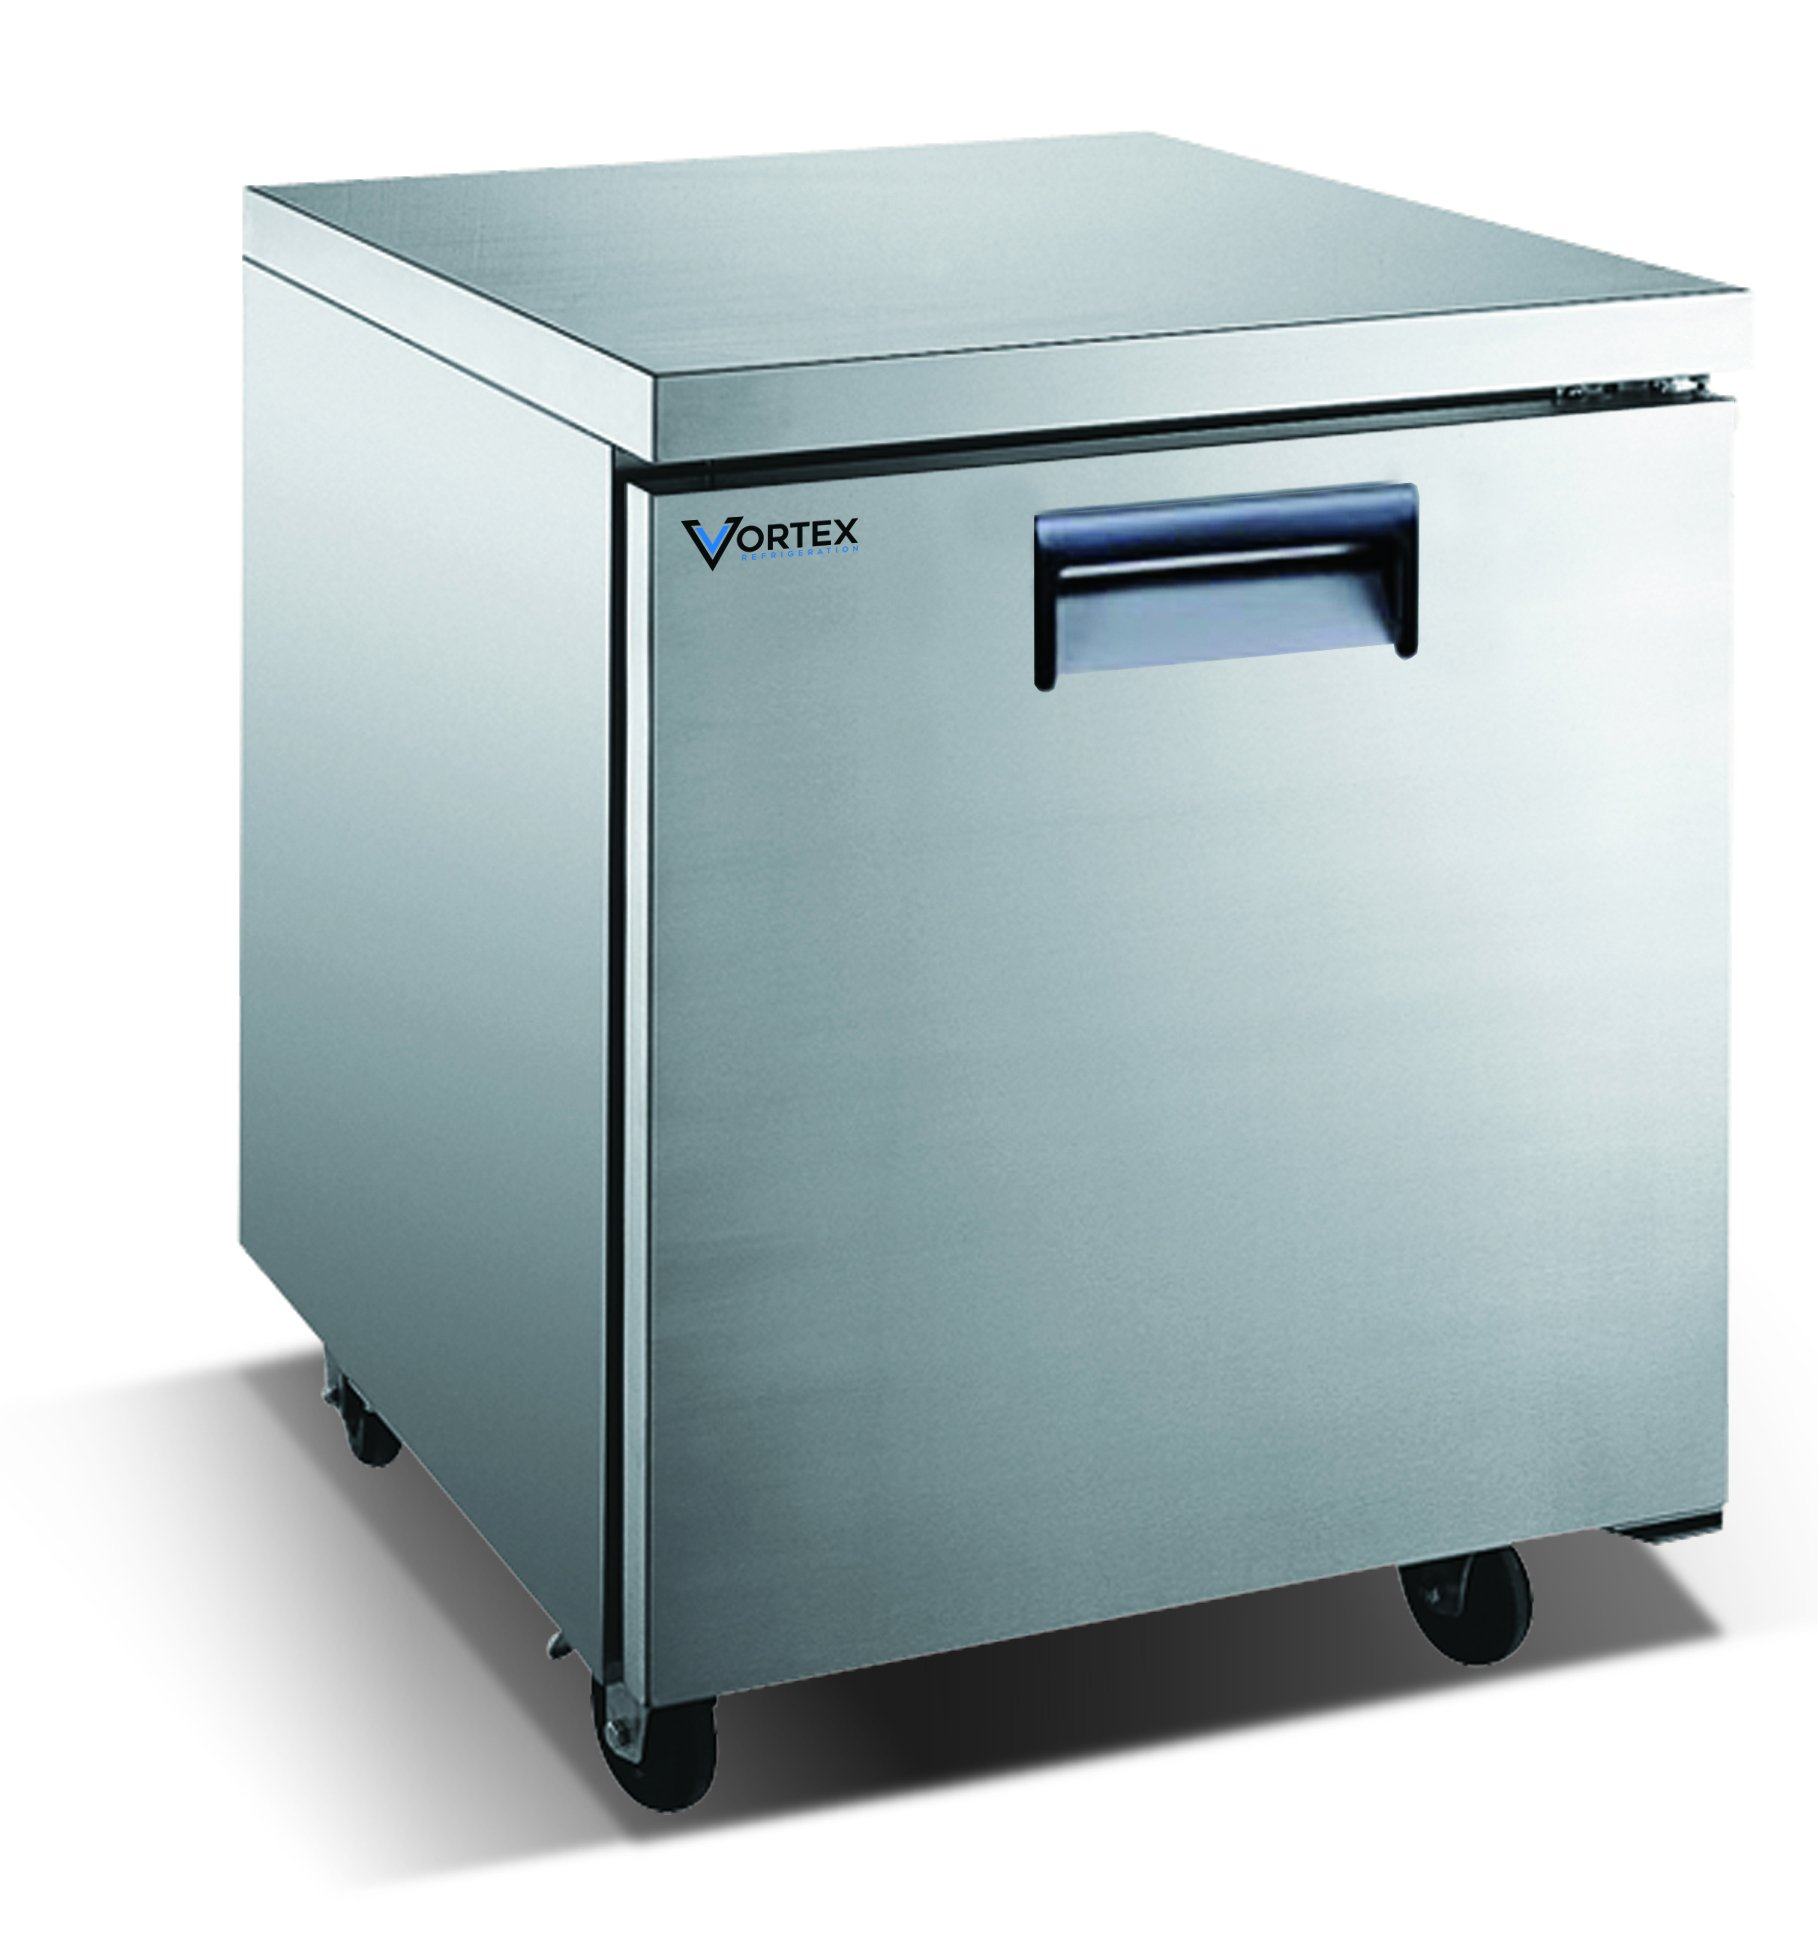 Vortex Refrigeration Commercial 1 Door 27'' Under Counter Refrigerator - 6.25 Cu. Ft.